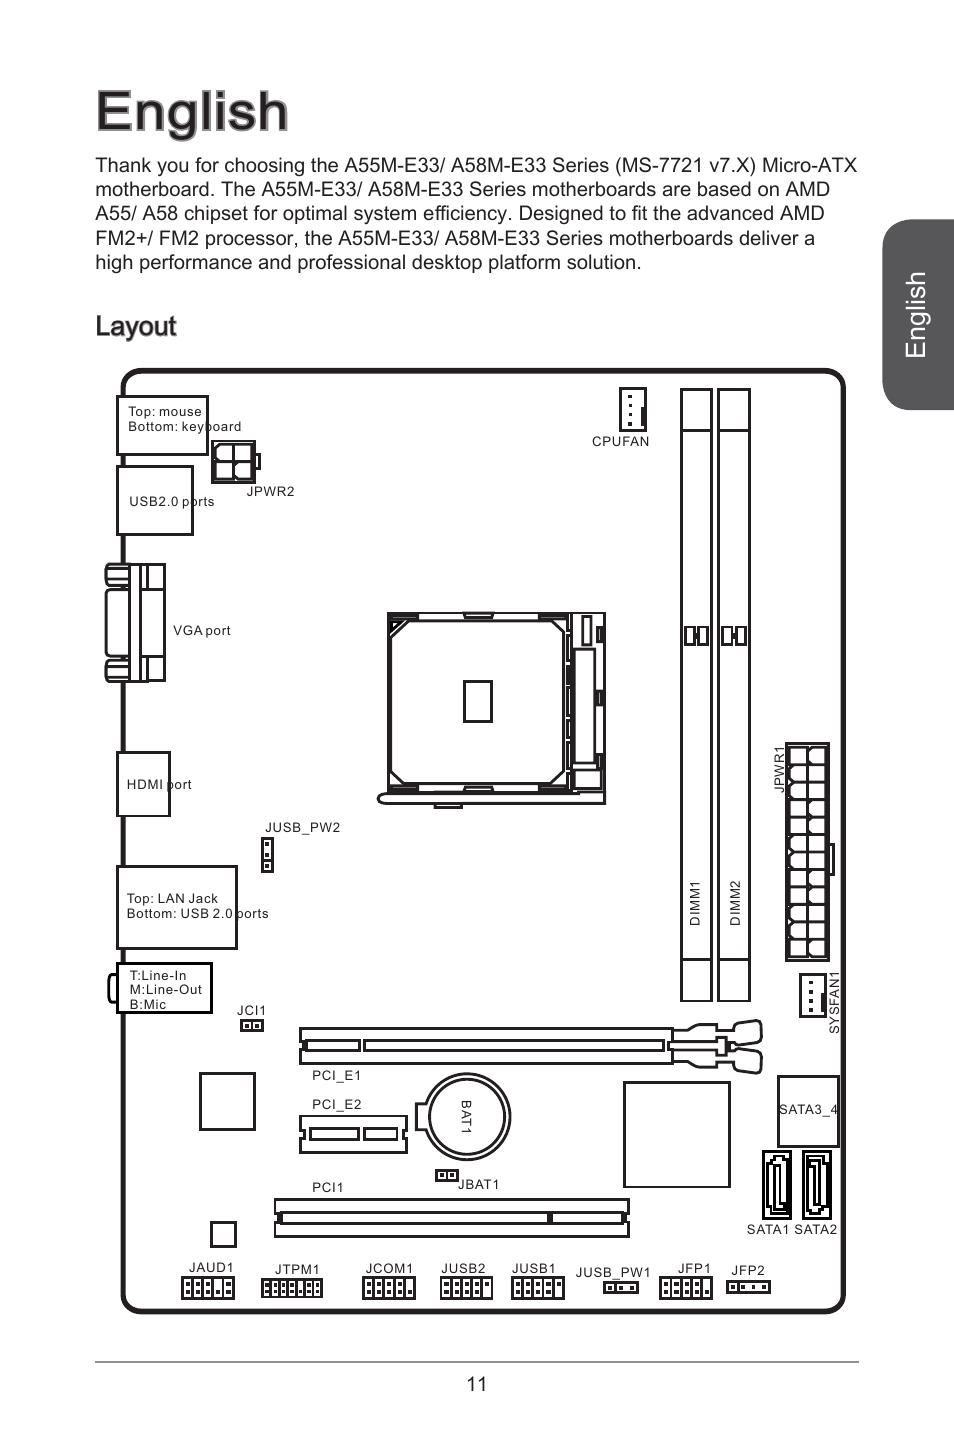 english layout msi a55m e33 user manual page 11 170 rh manualsdir com msi h61m-p31/w8 wiring diagram msi h61m-p31/w8 wiring diagram